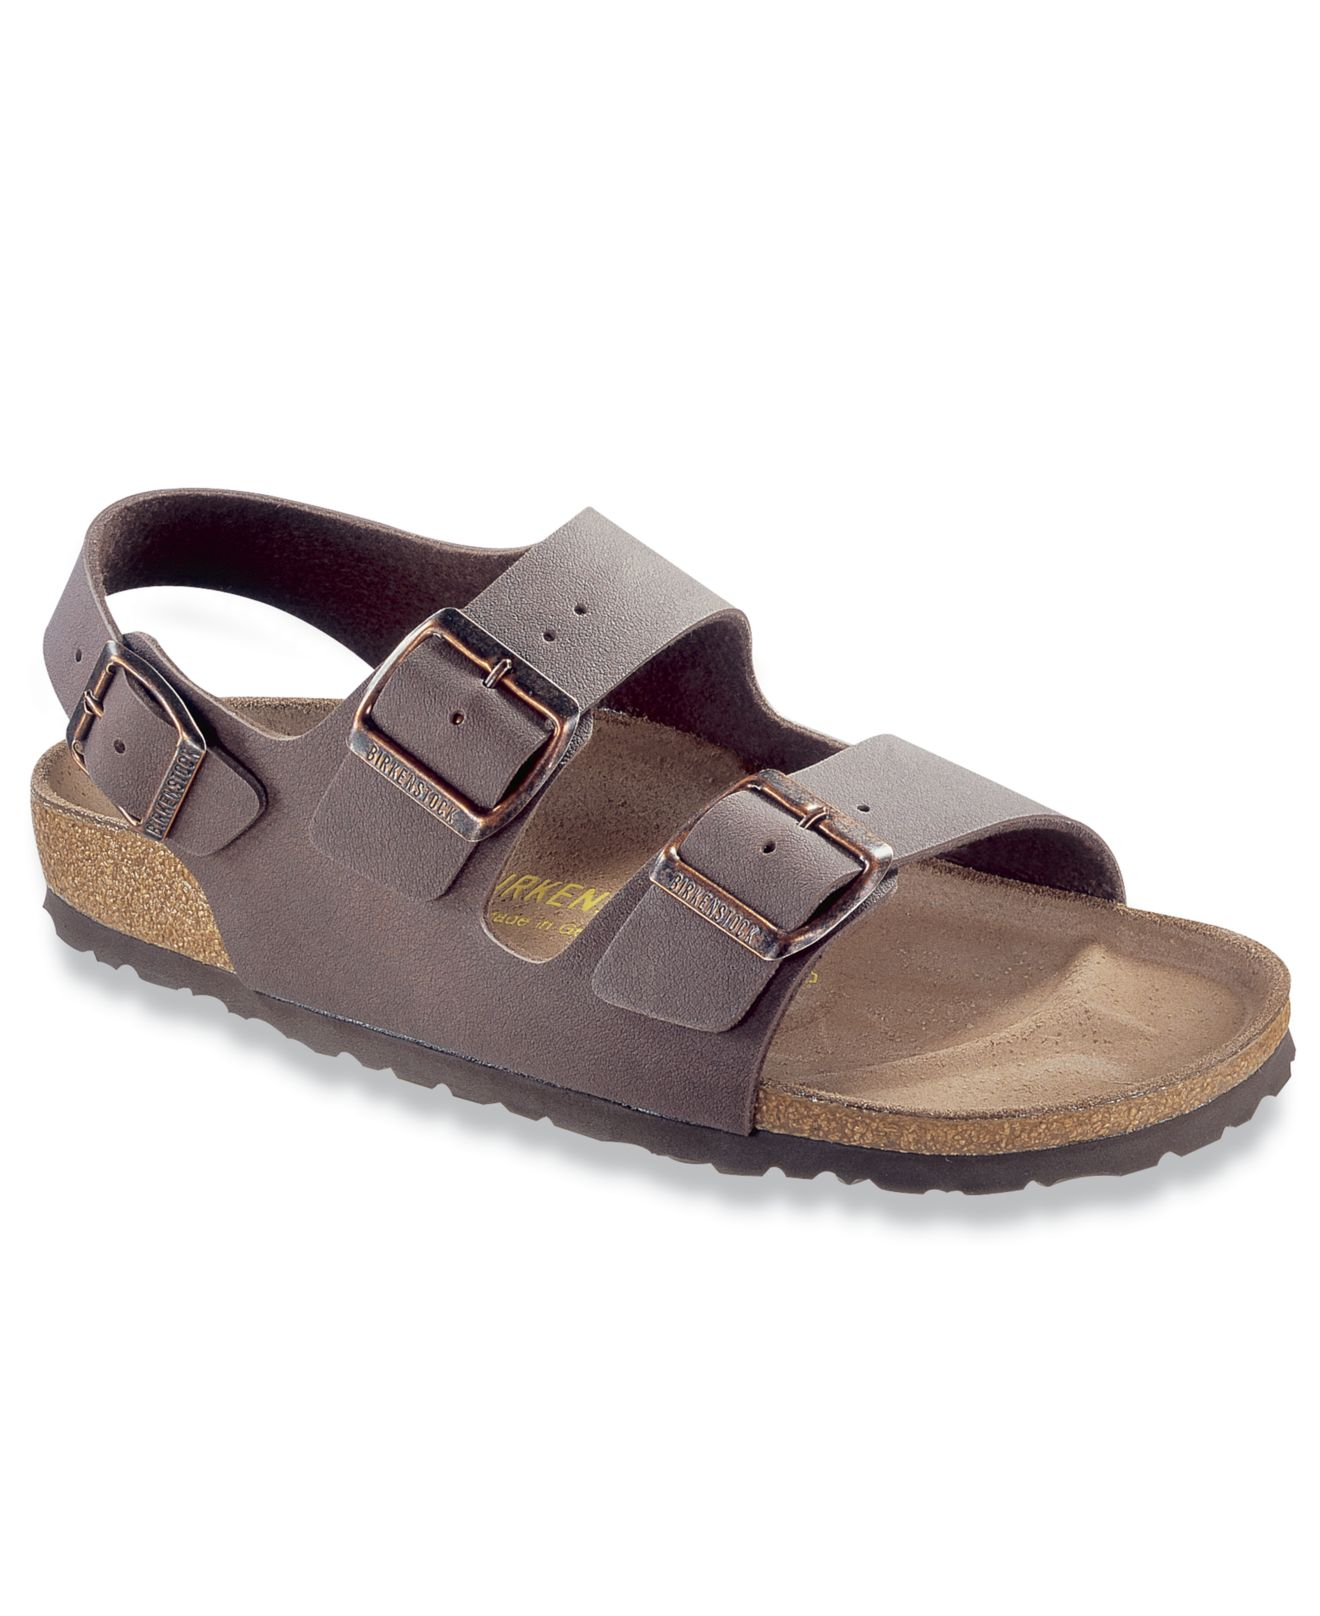 Lyst Birkenstock Milano Birkibuc Back Strap Sandals In